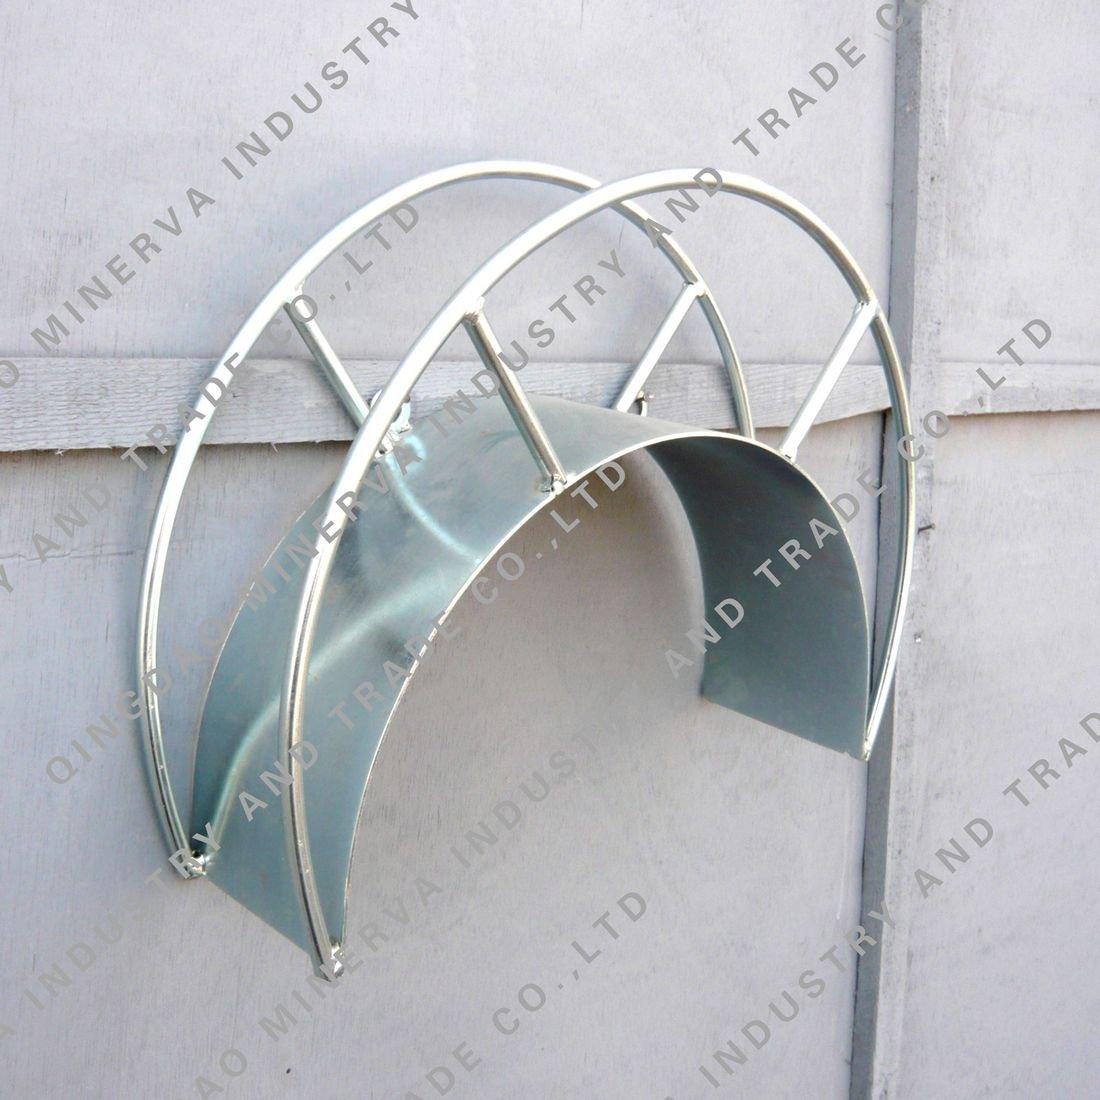 Water Hose Hanger Water Hose Galvanize Metal